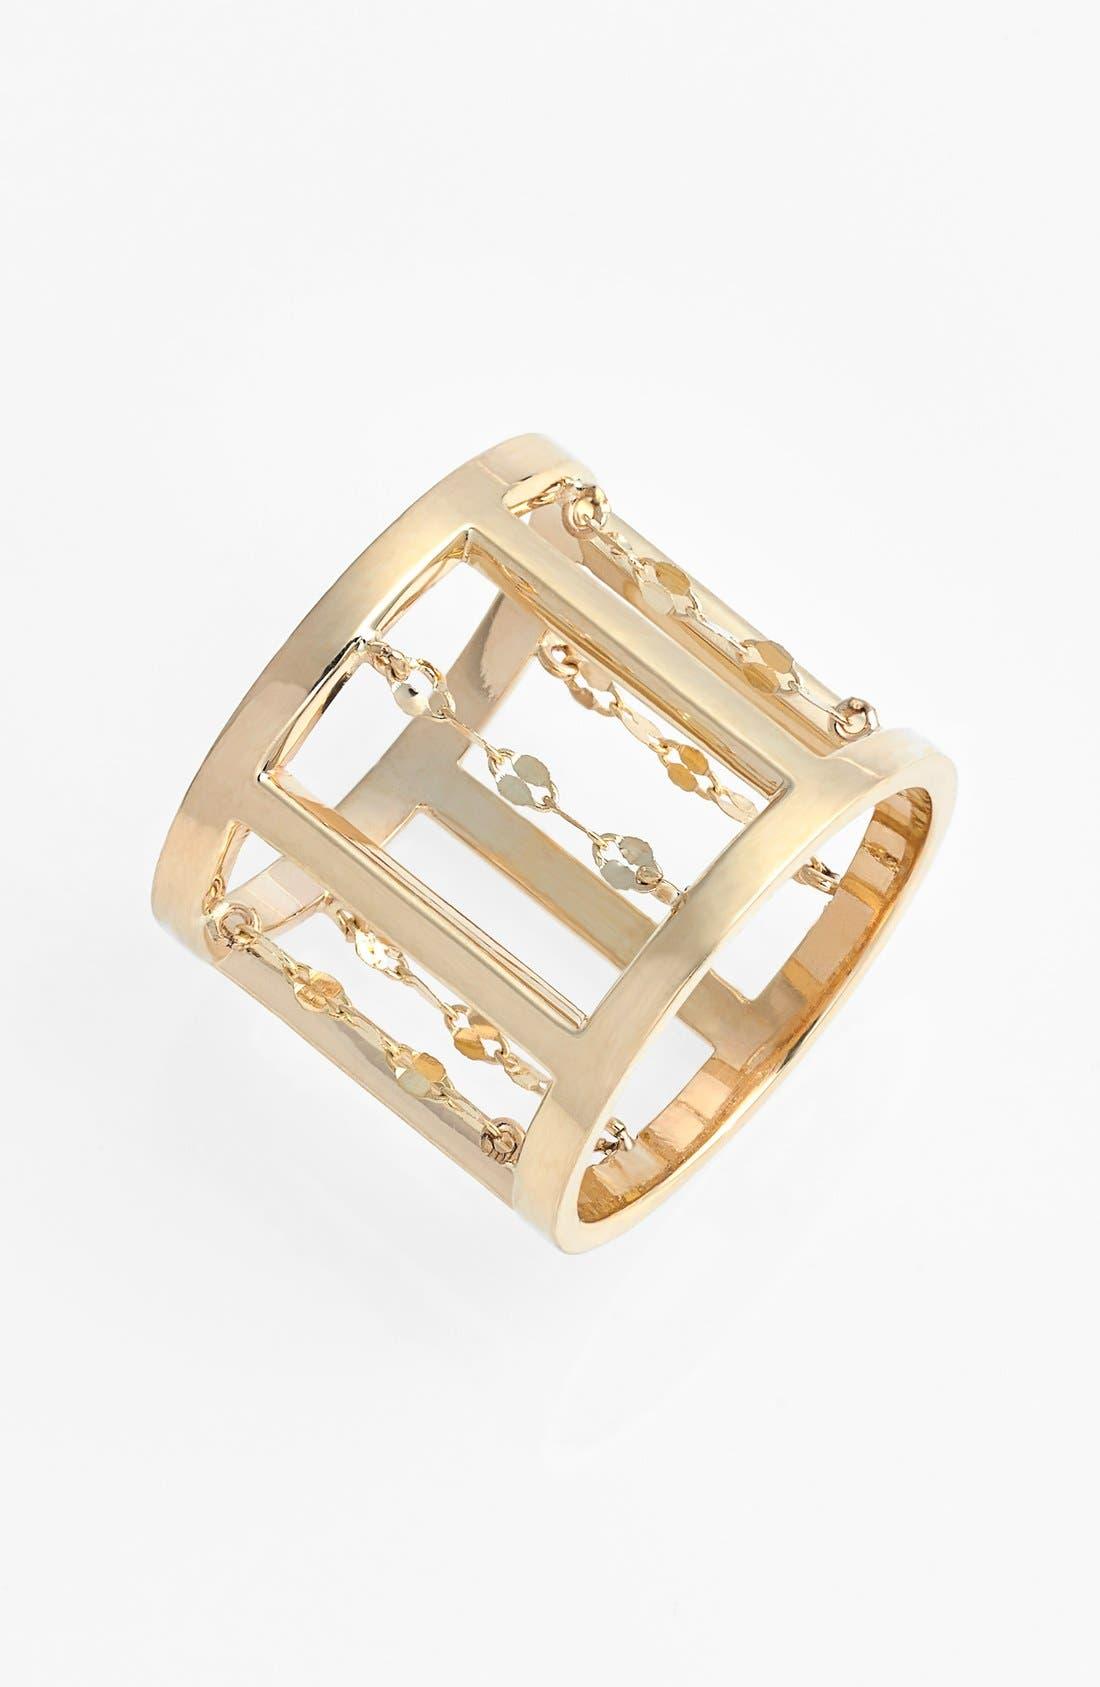 Main Image - Lana Jewelry Open Cigar Band Ring